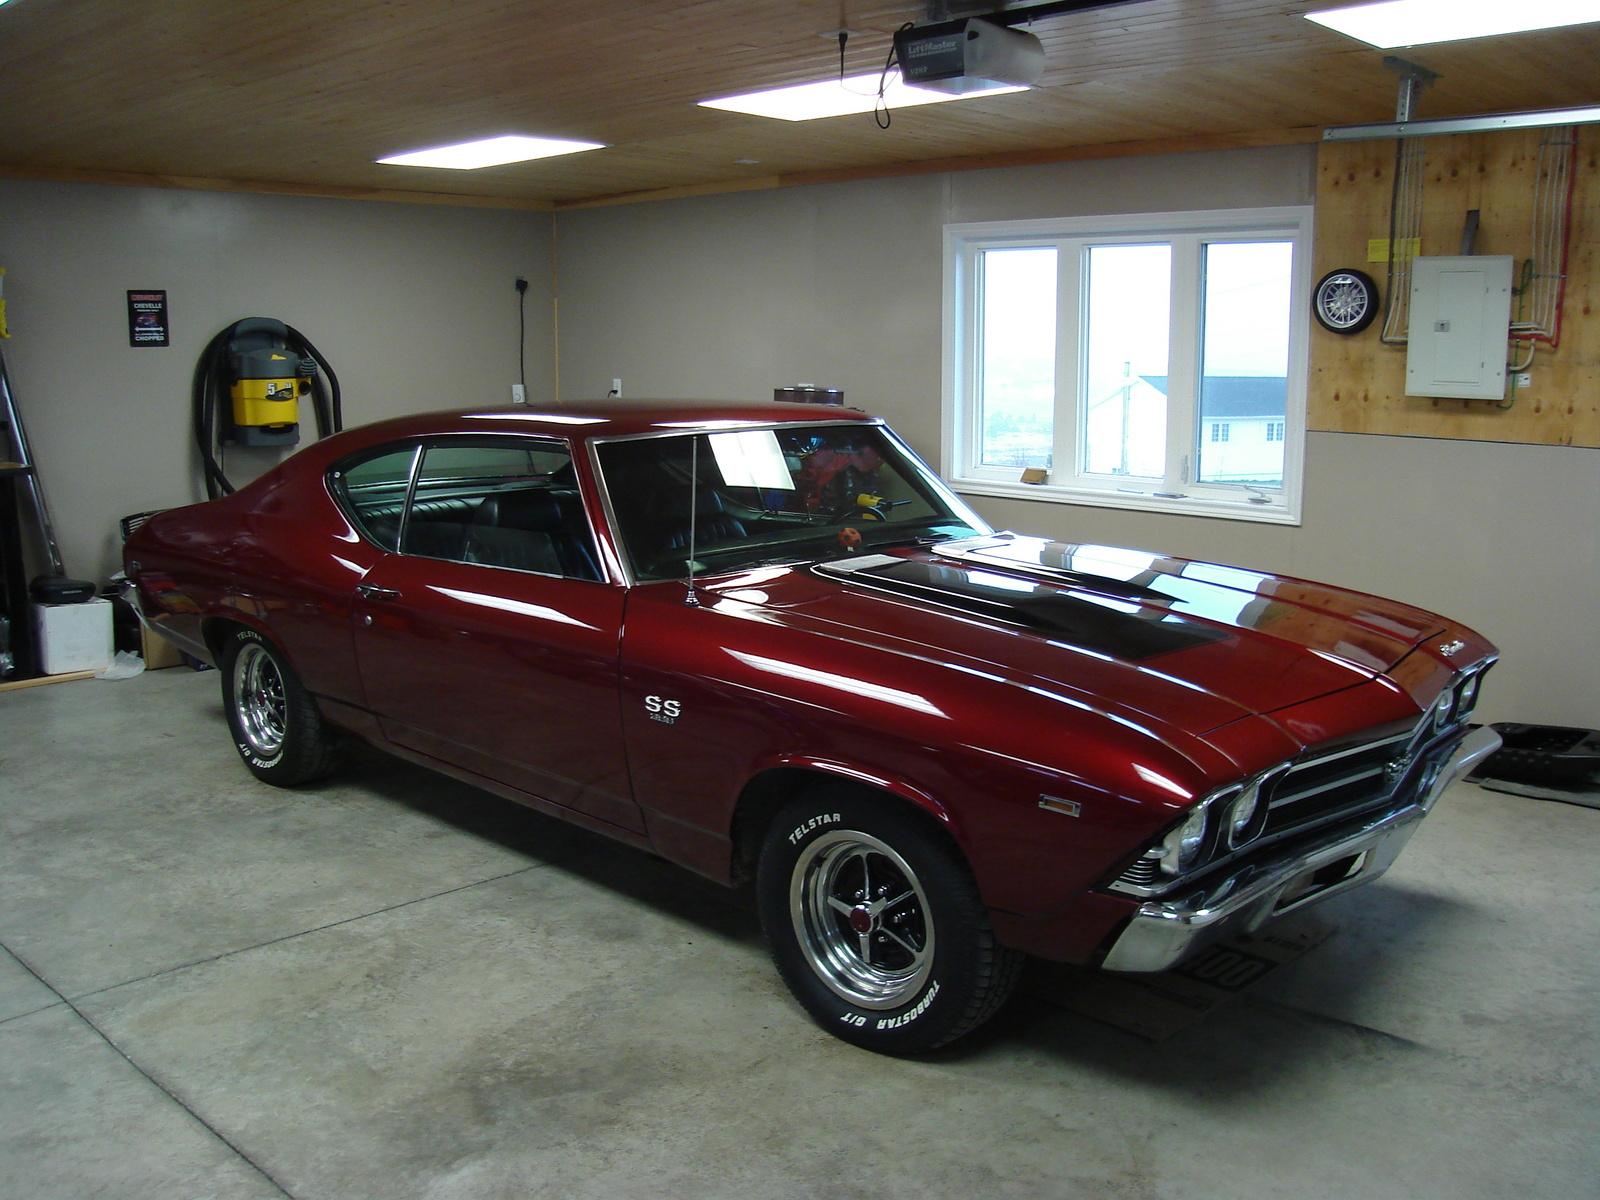 1969 Chevrolet Chevelle Pictures C3655 pi35817720